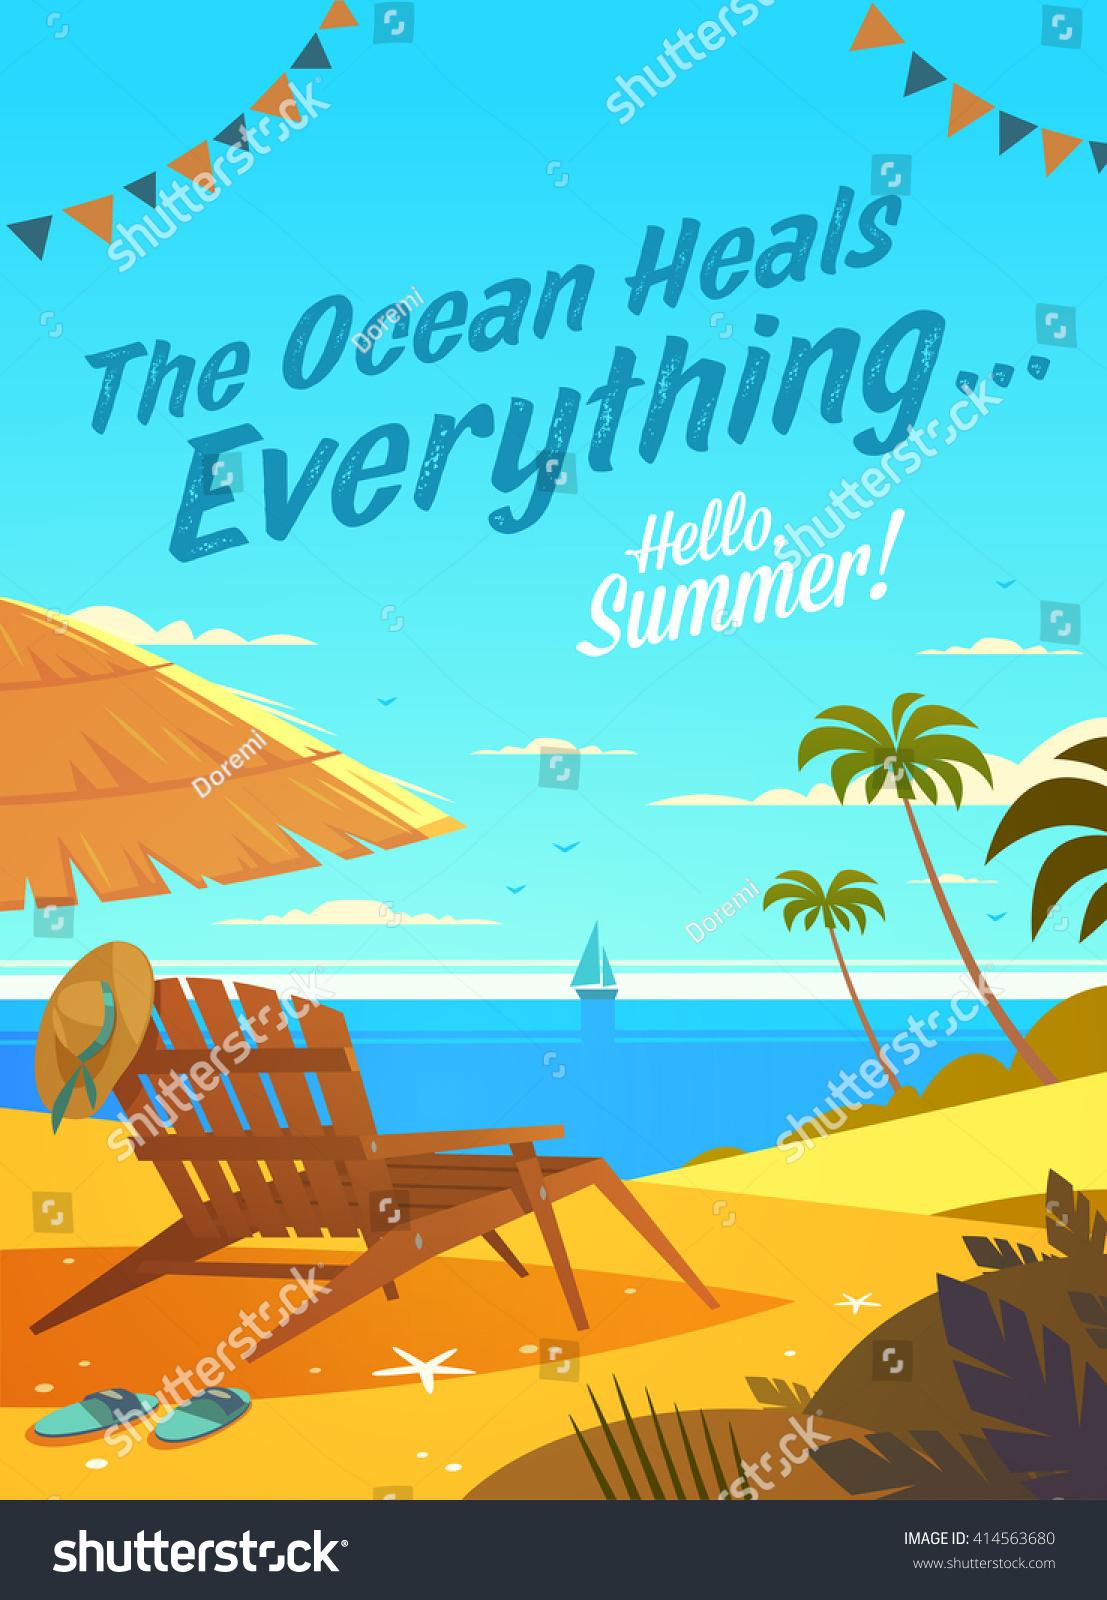 ocean heals everything summertime quote summer stock vector royalty